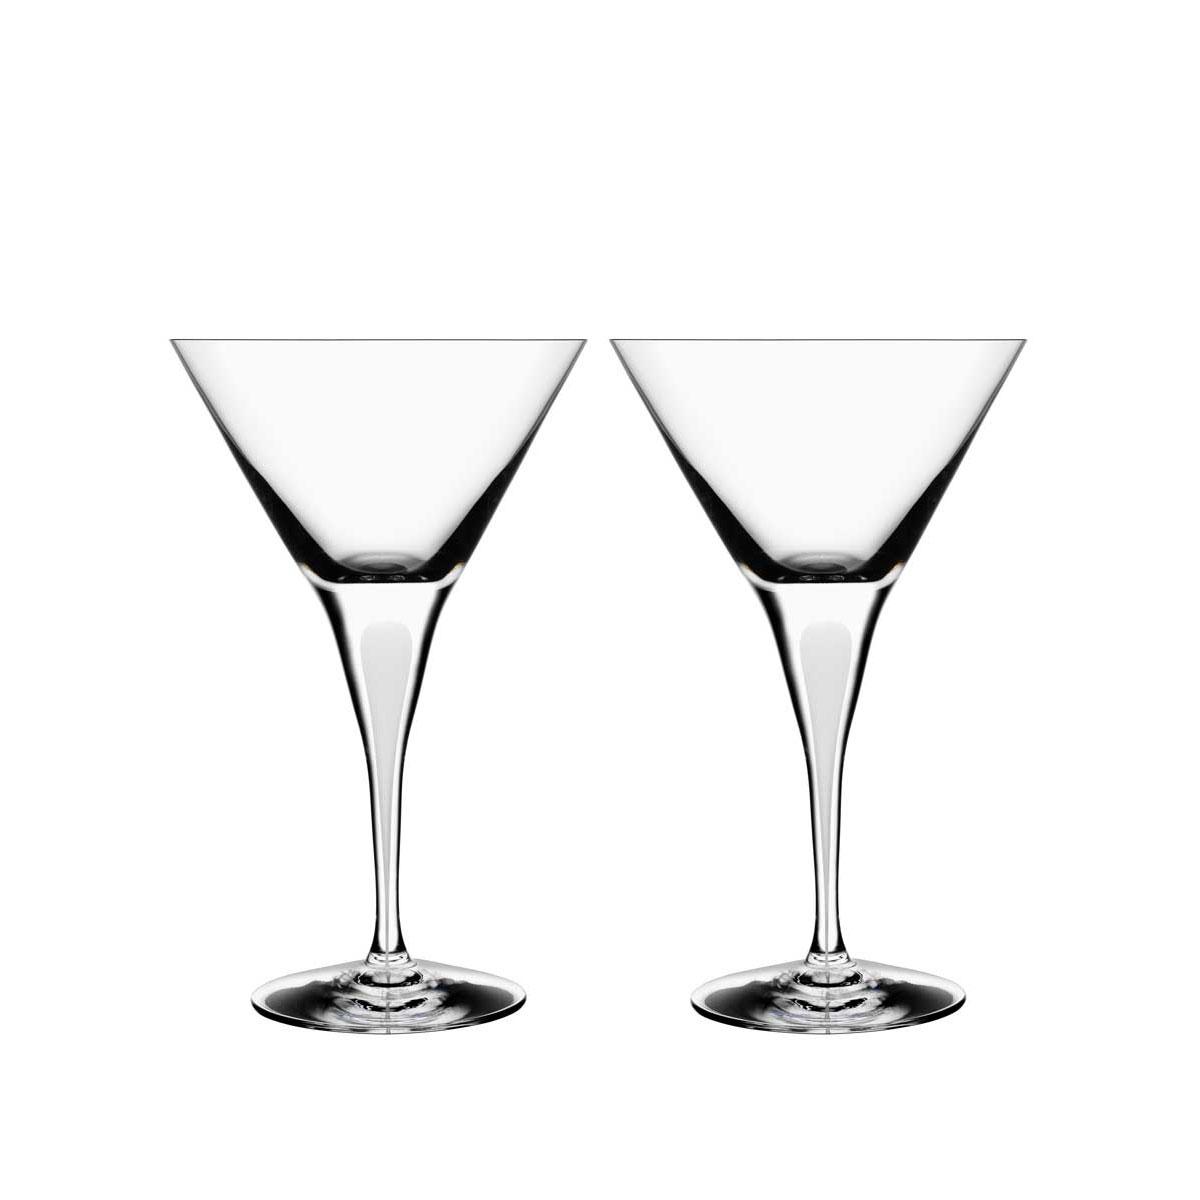 Orrefors Crystal, Intermezzo Satin Crystal Martini, Pair